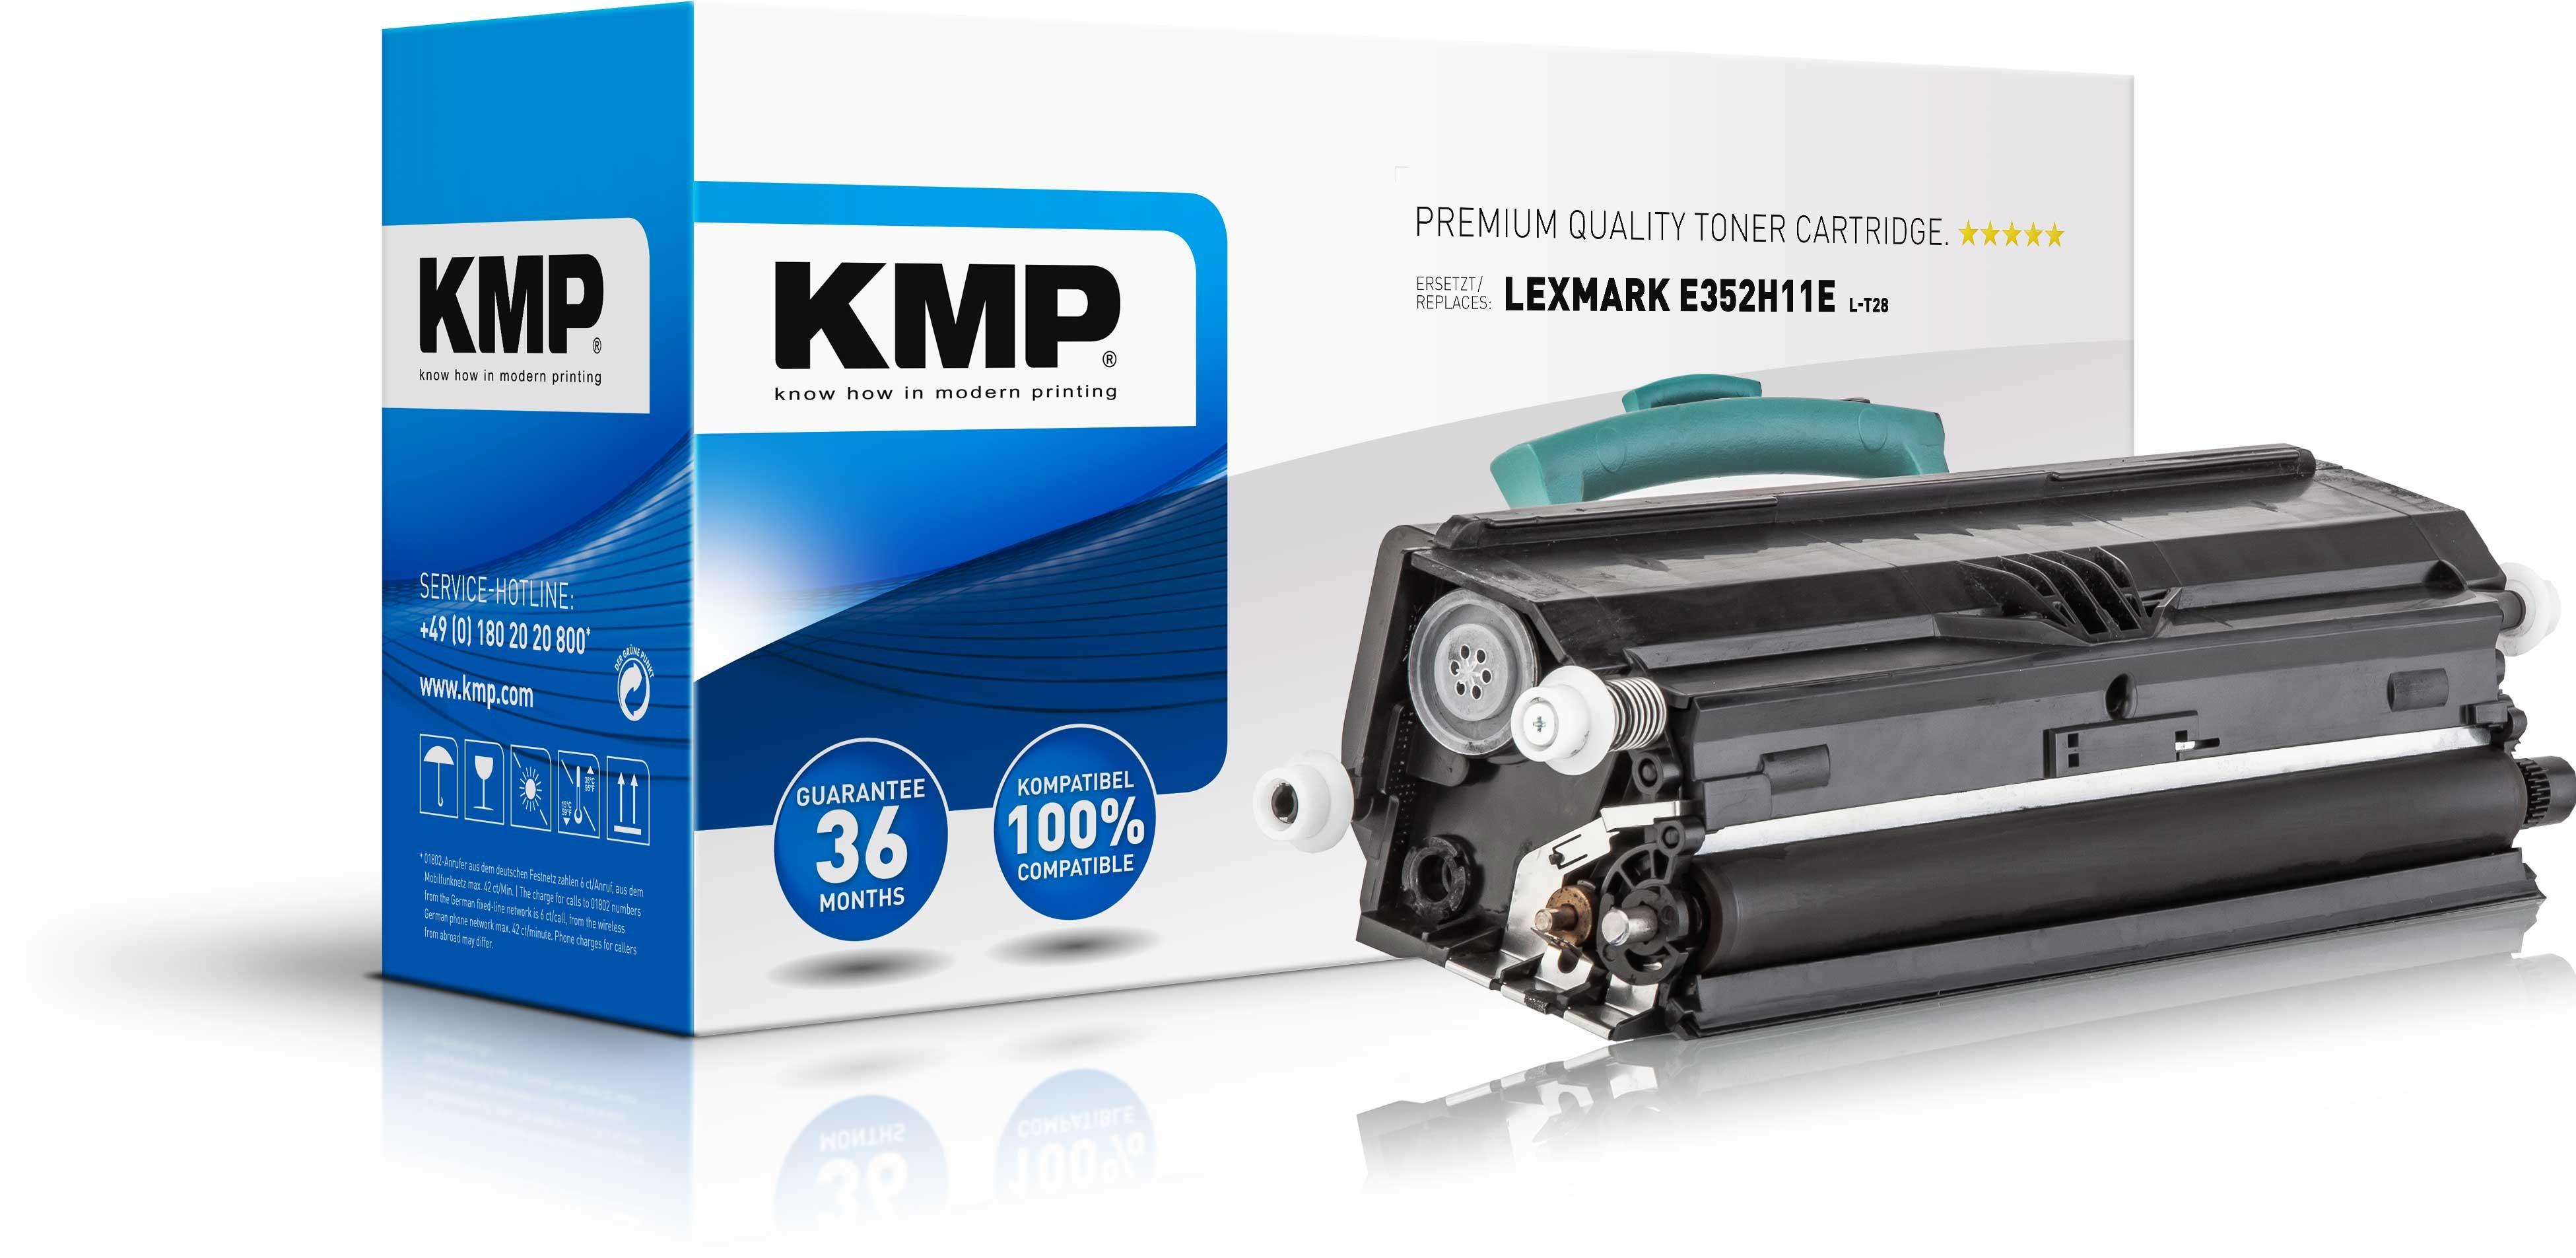 KMP Lexmark Toner für E352H11E E250 / E350 schwarz L-T28